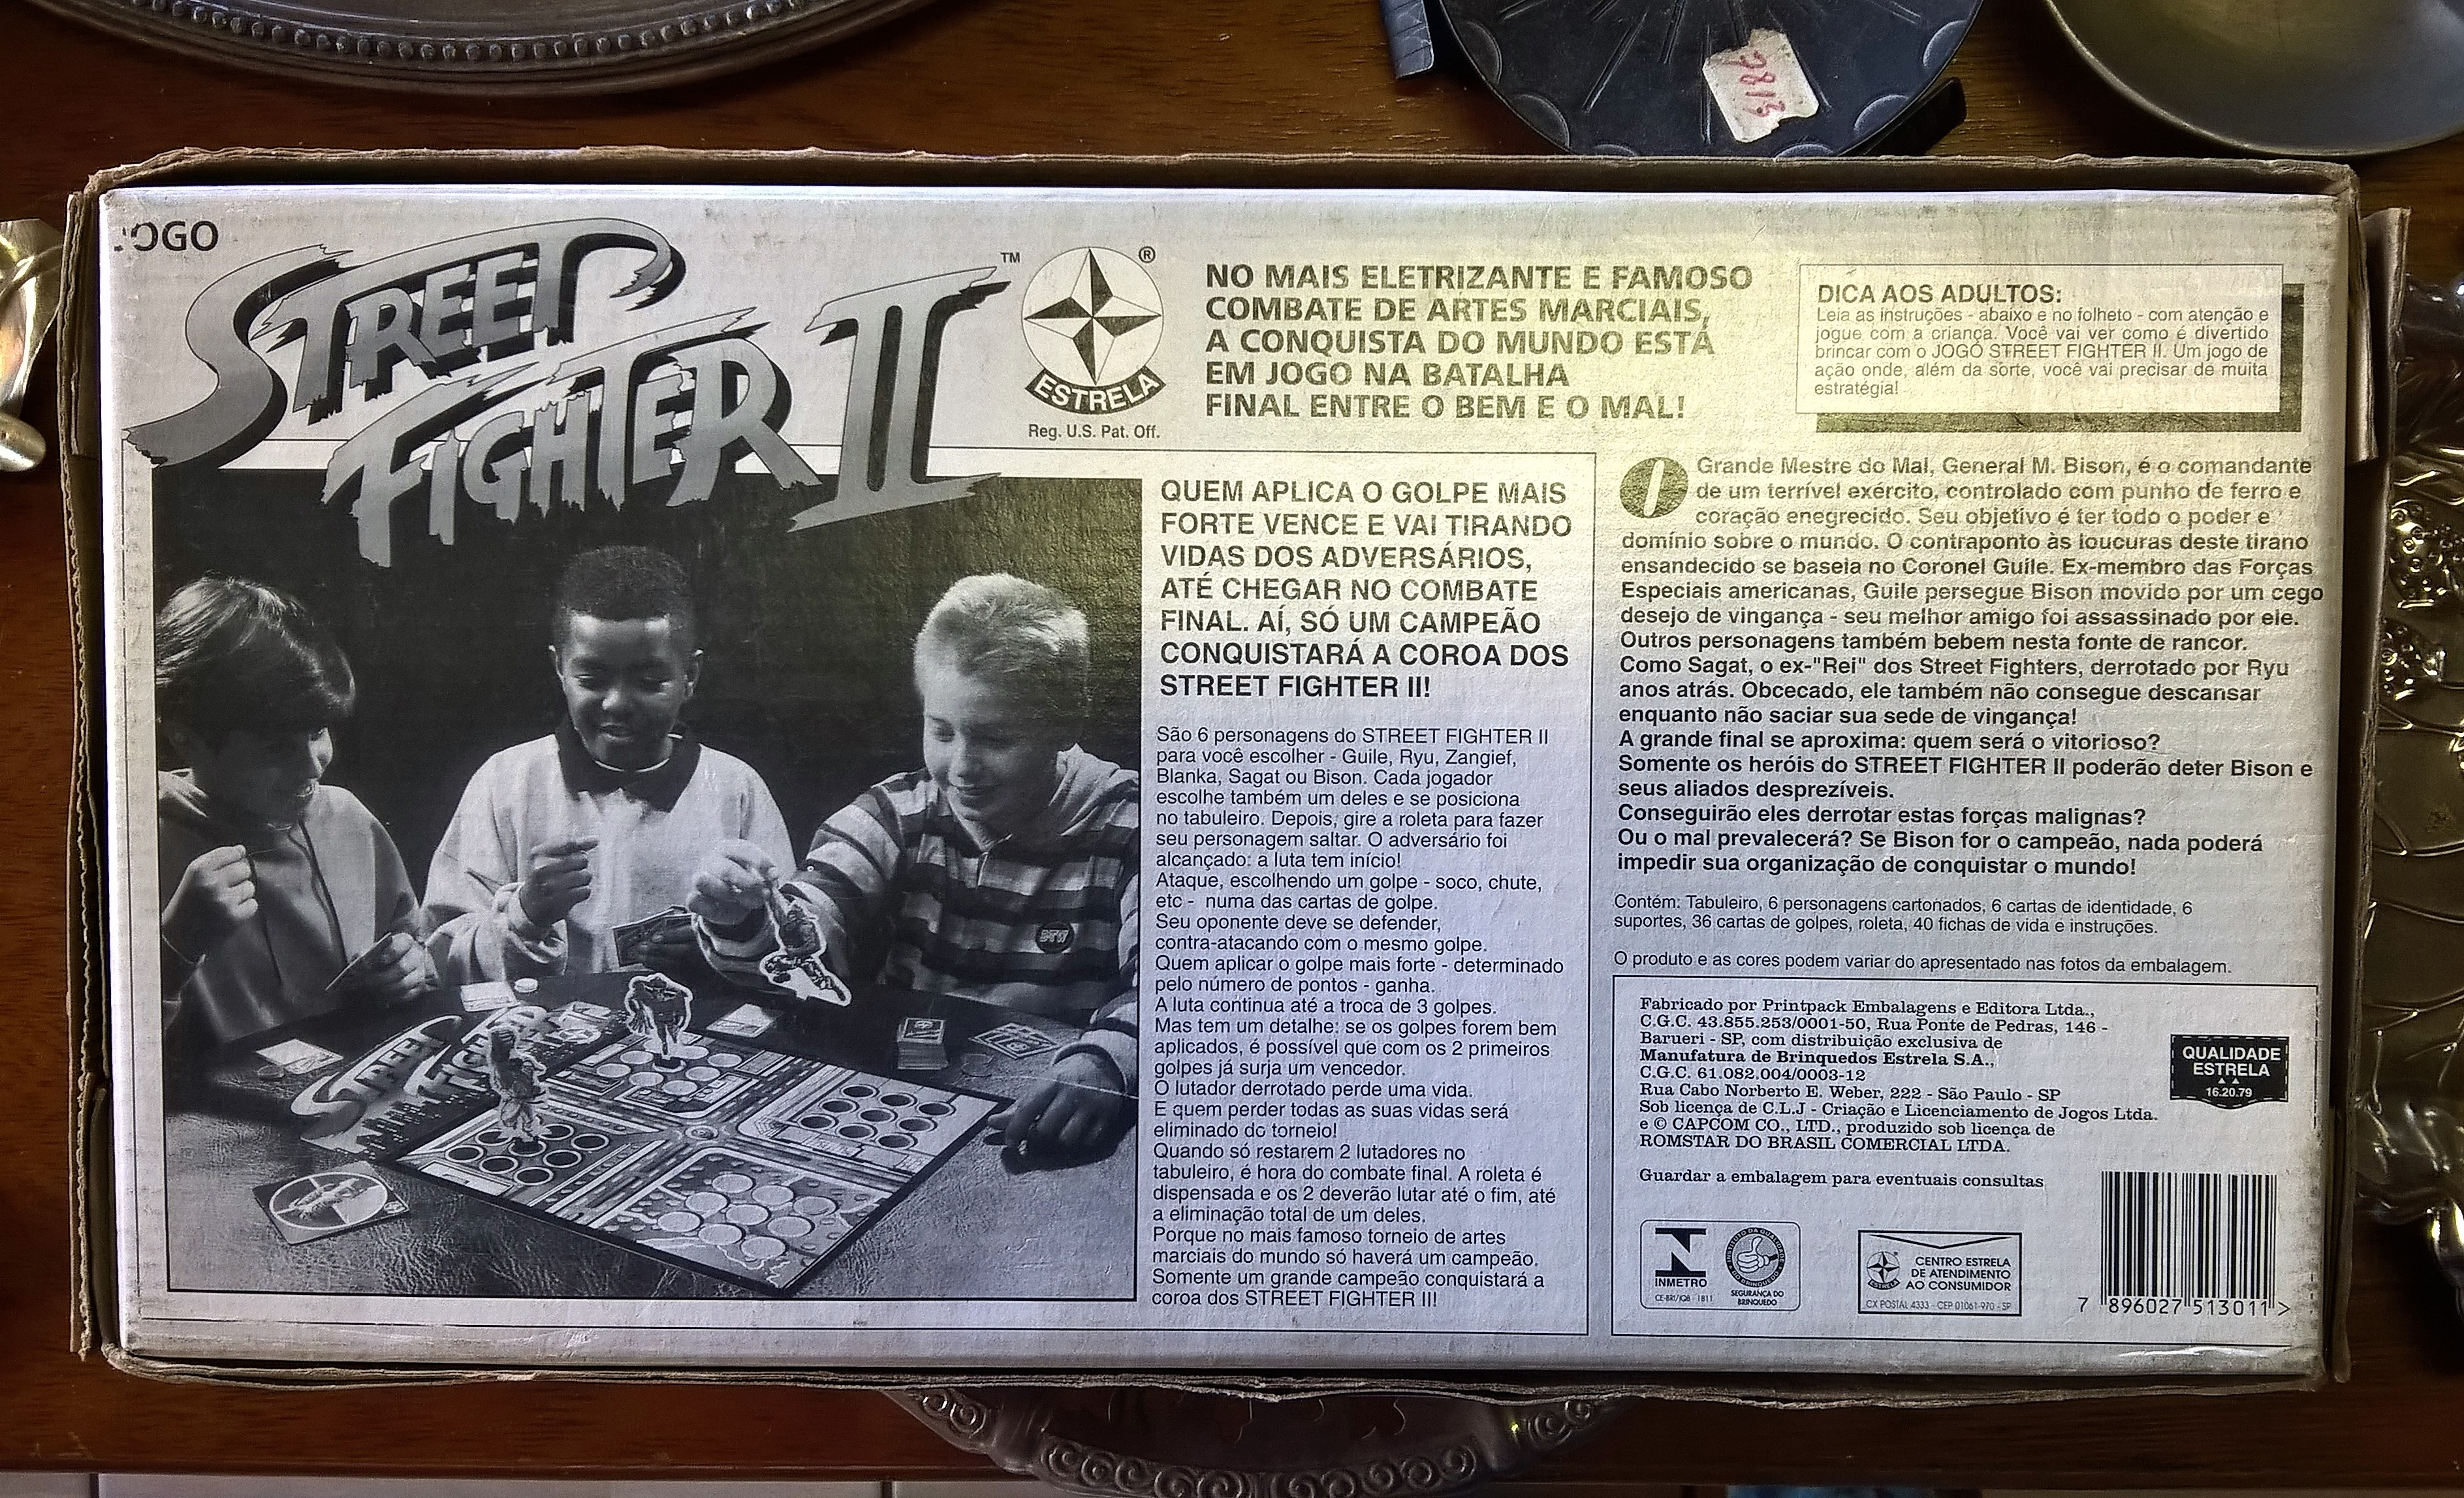 Jogo de tabuleiro de Street Fighter II, da Estrela